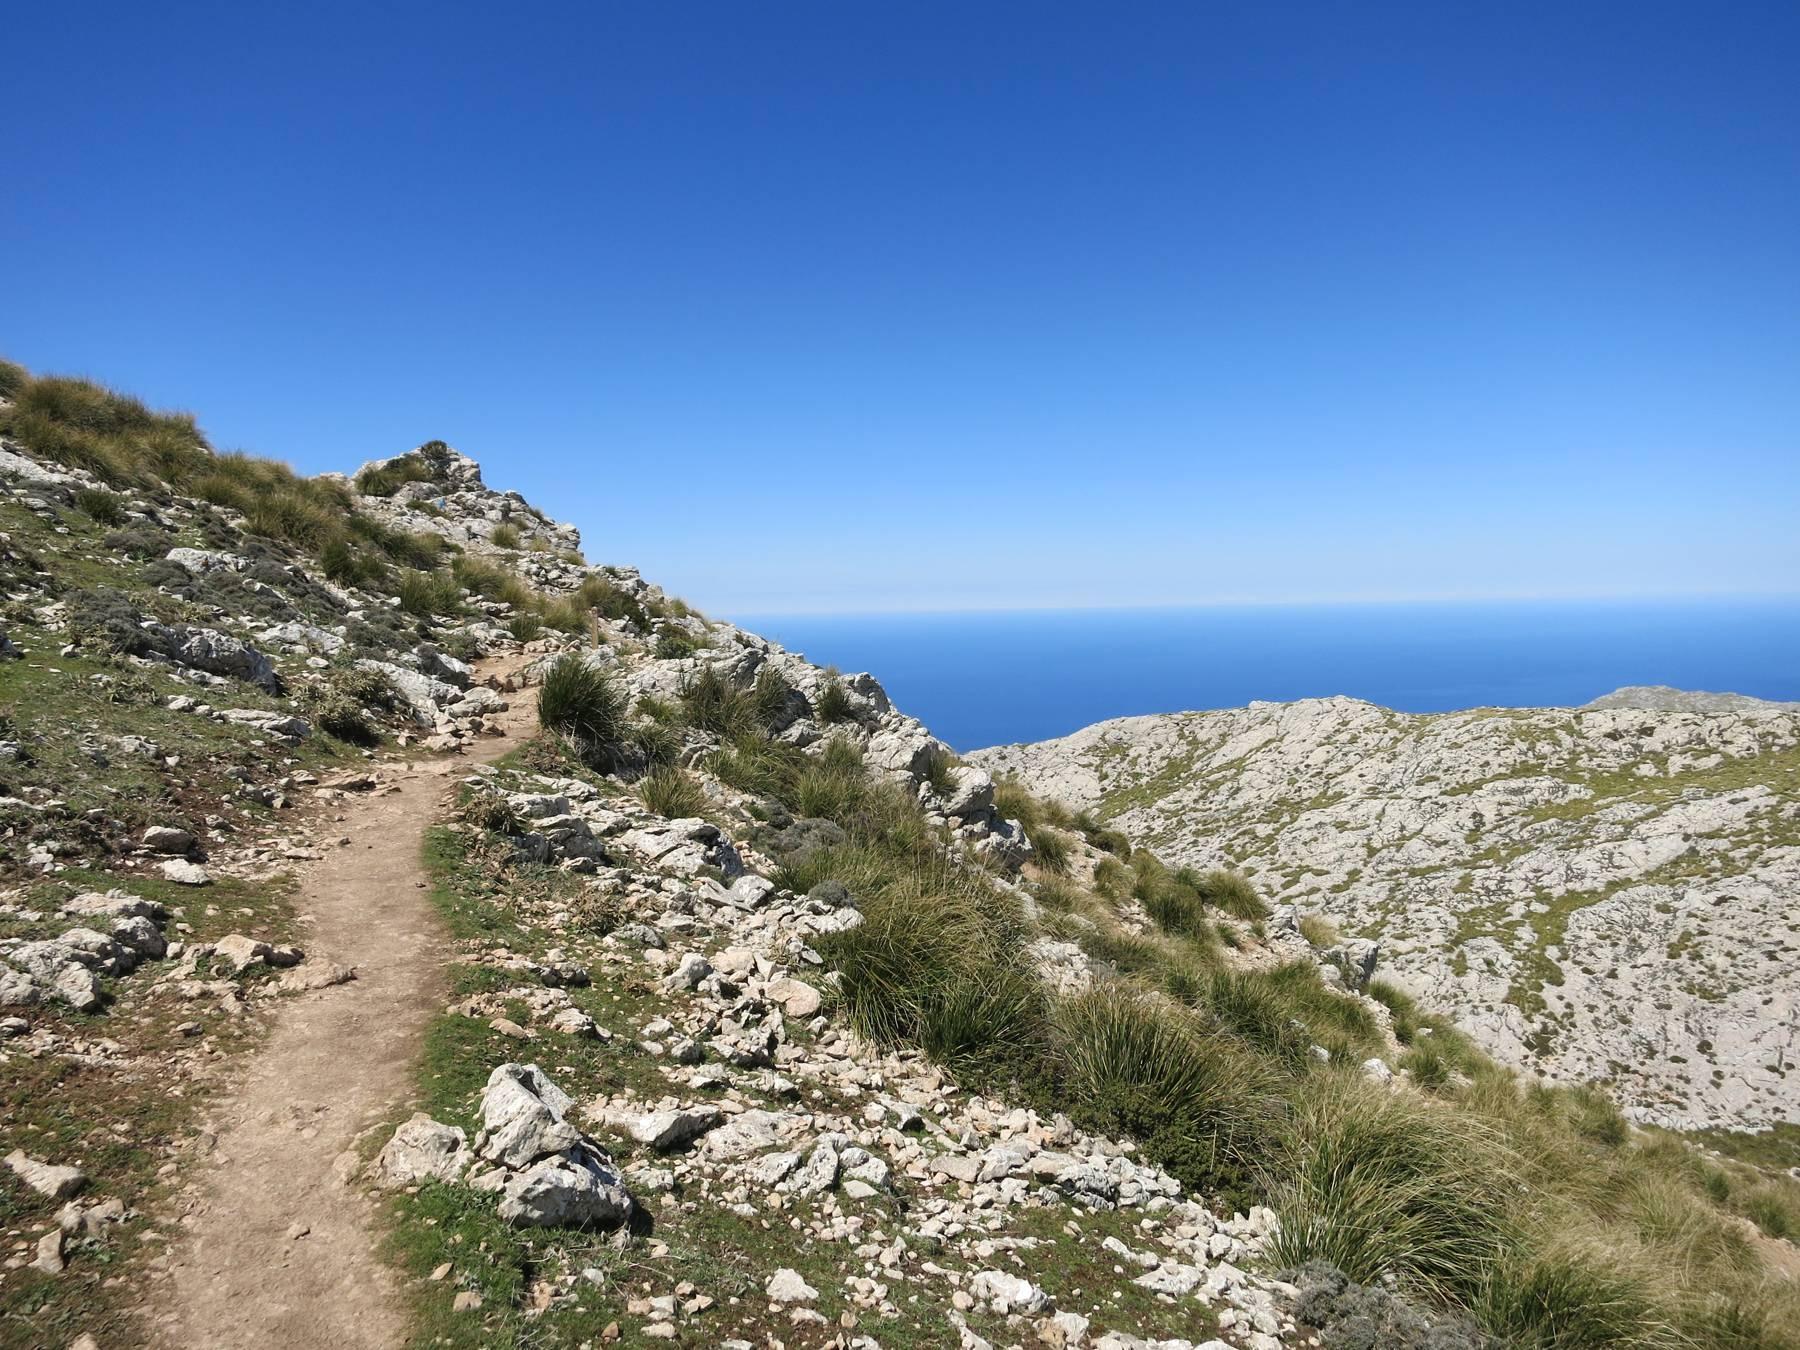 Bergetappe (GR221) mit grandiosem Ausblick aufs Meer auf dem Weg nach Lluc